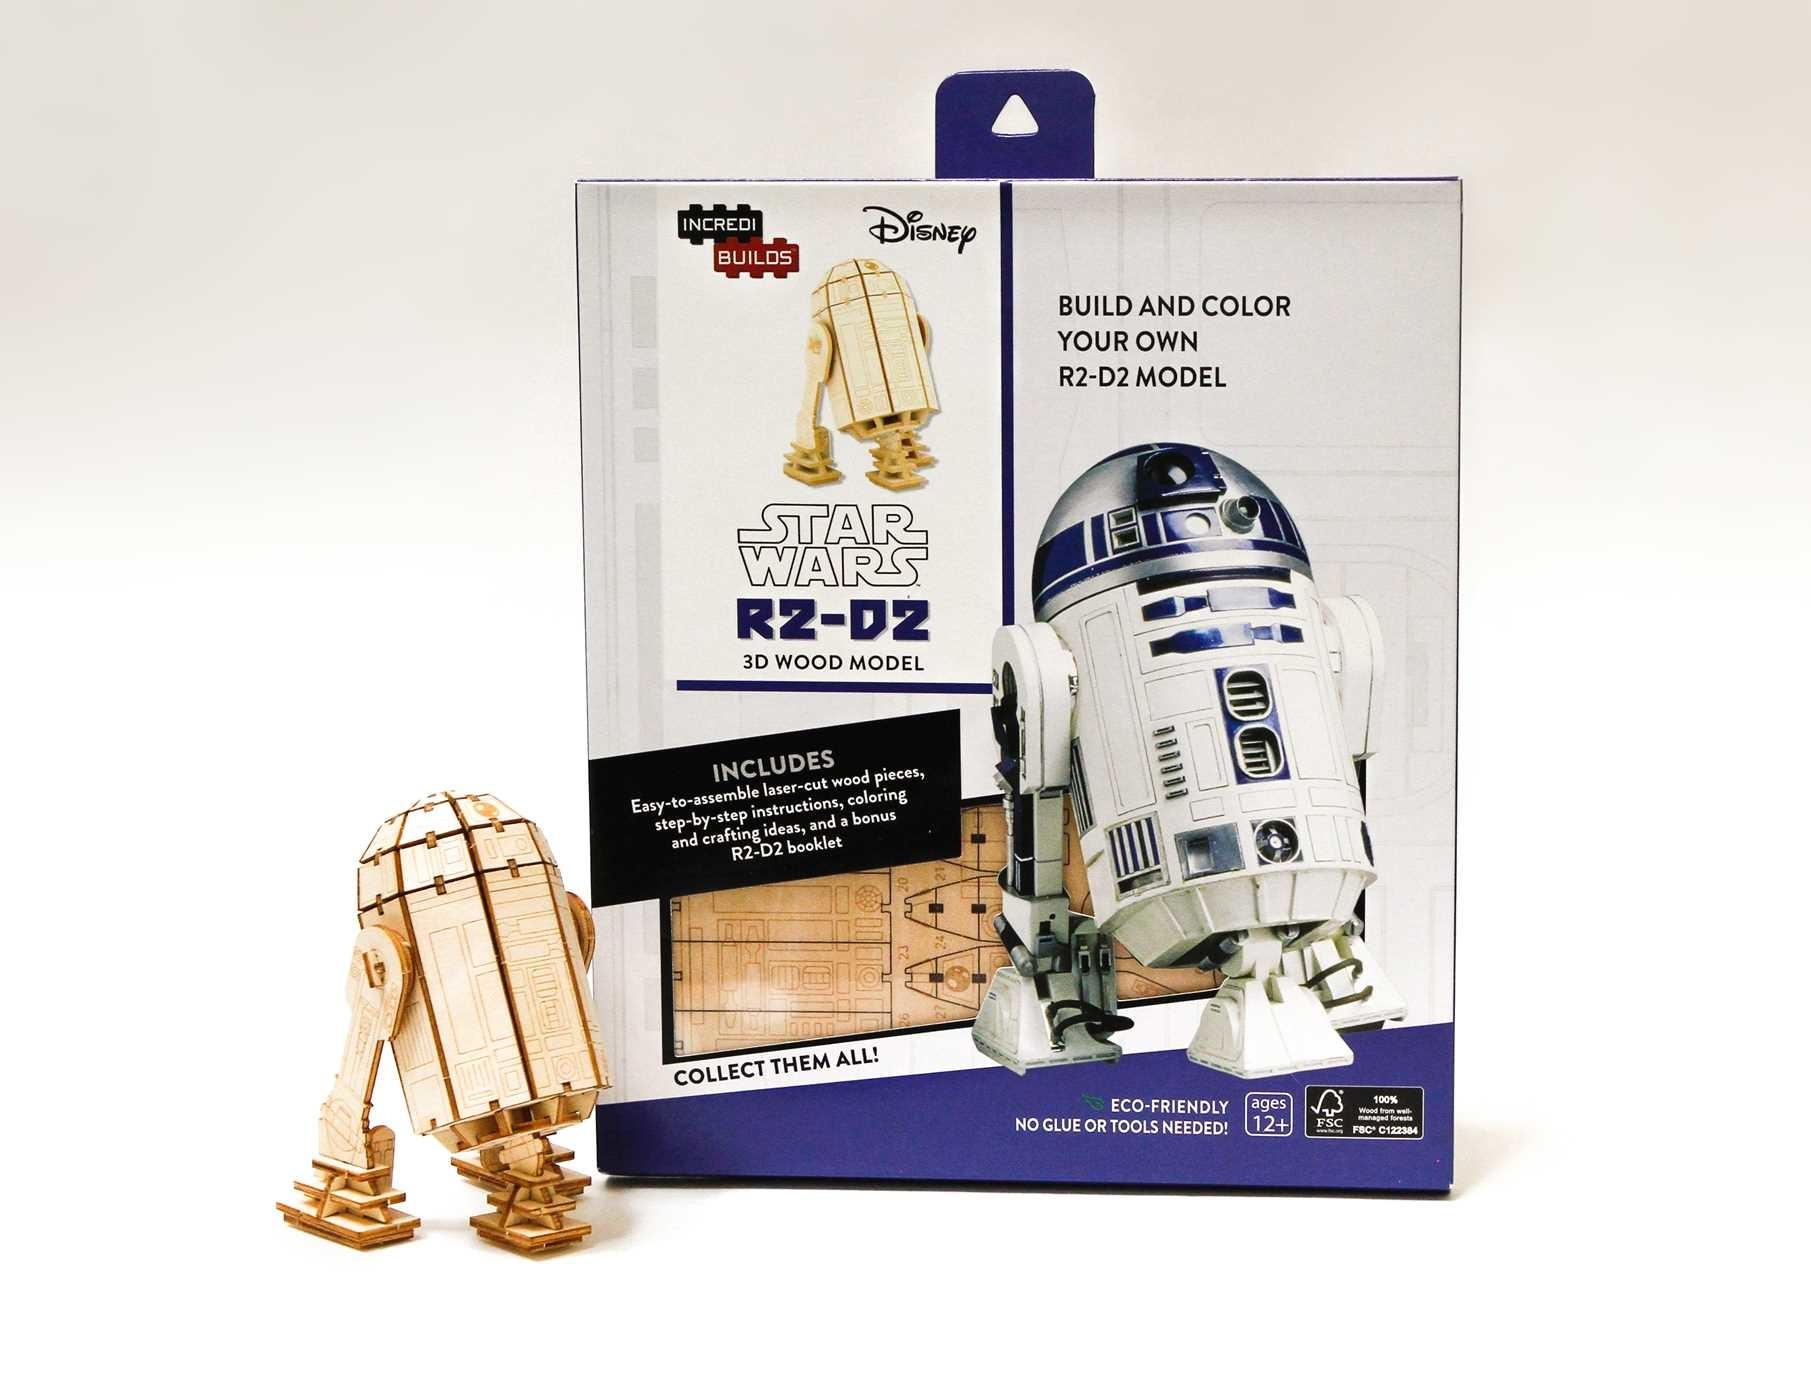 Incredibuilds star wars r2 d2 3d wood model 9781682980279.in03